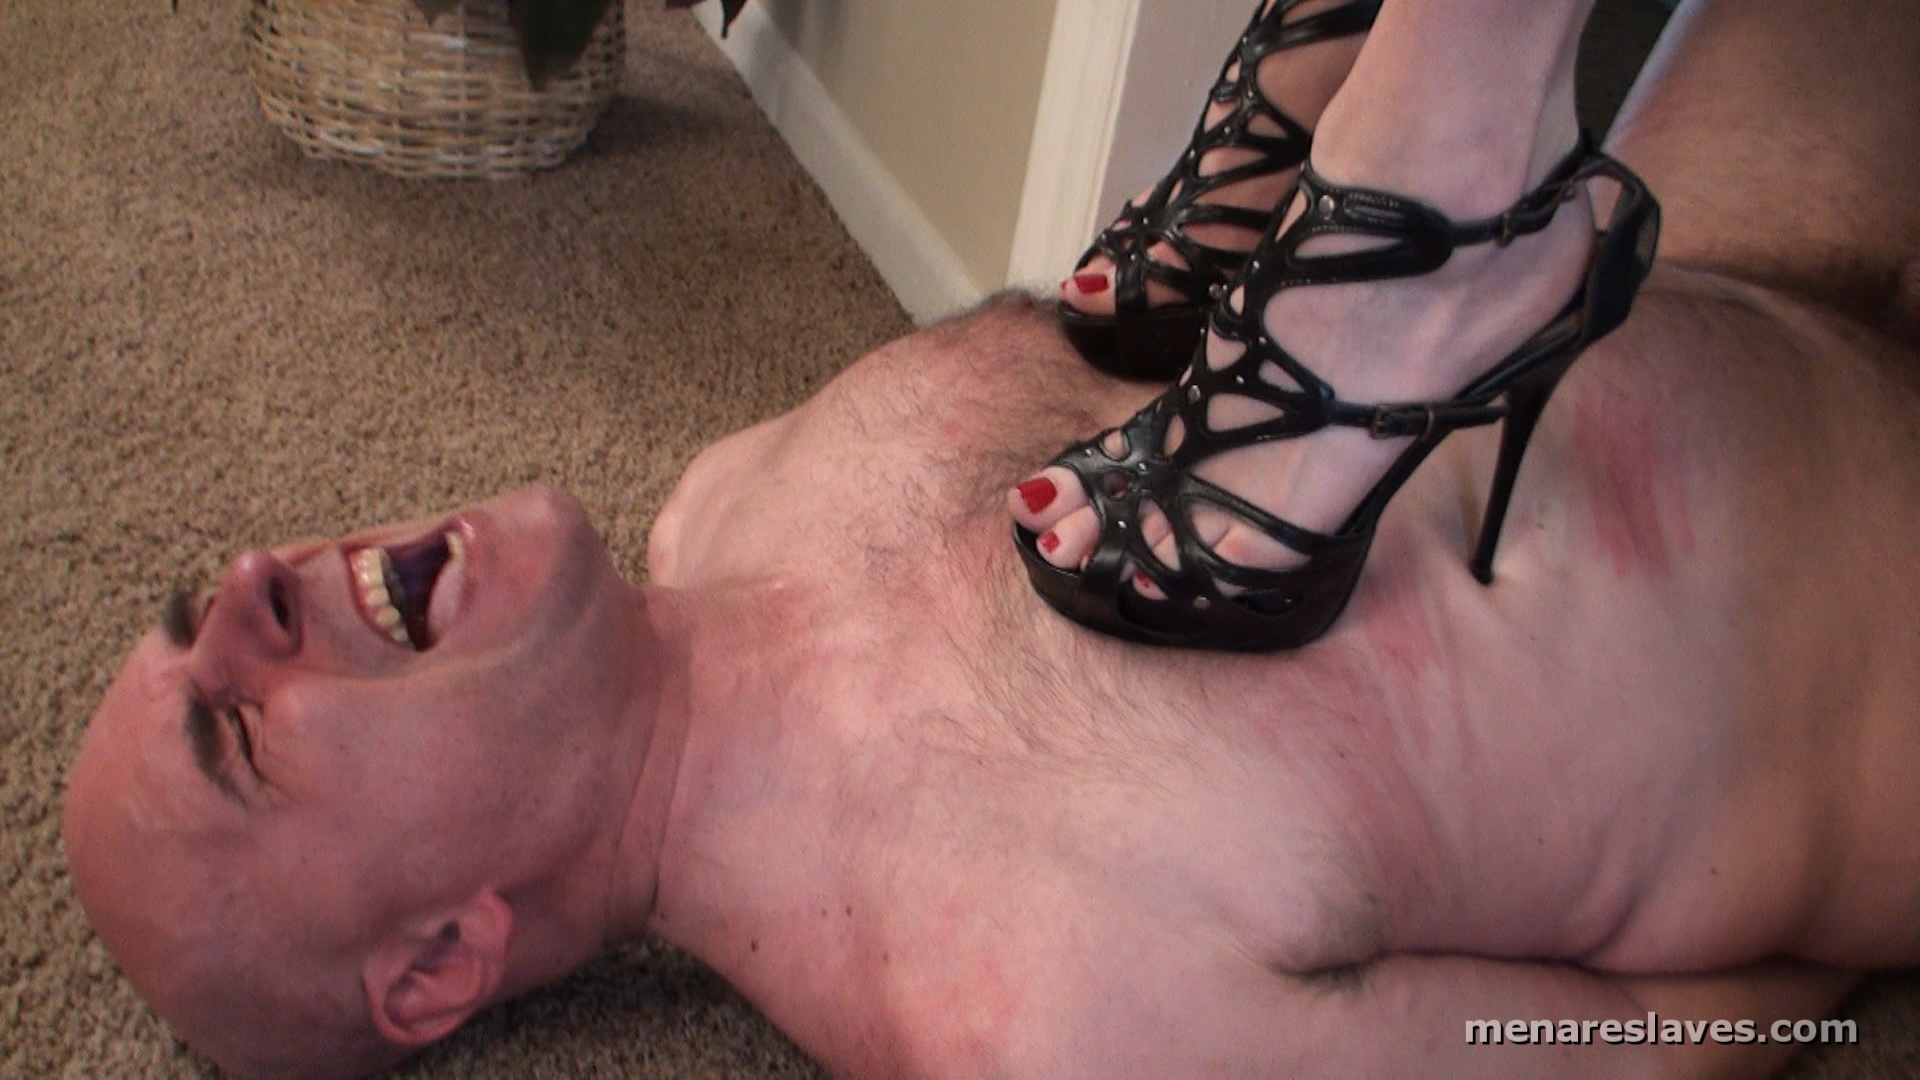 Not understand fetish heeled high mistress All above